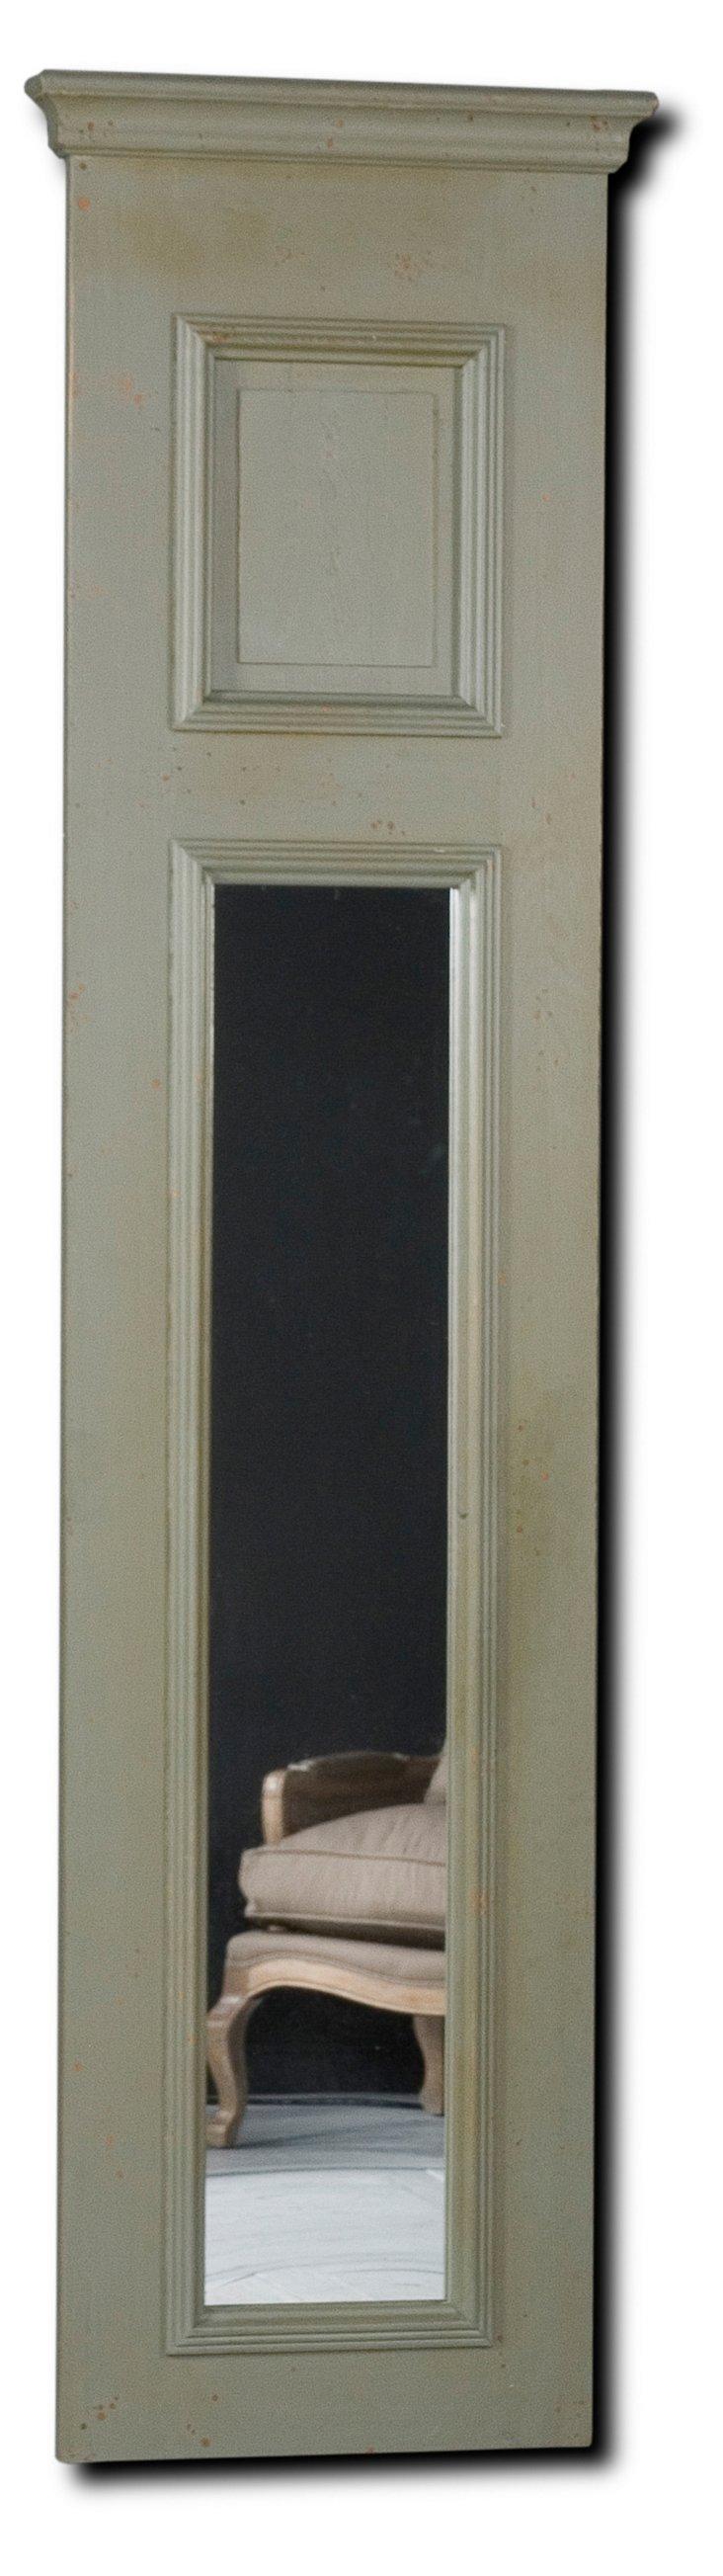 Anna Panel Mirror, Rustic Gray